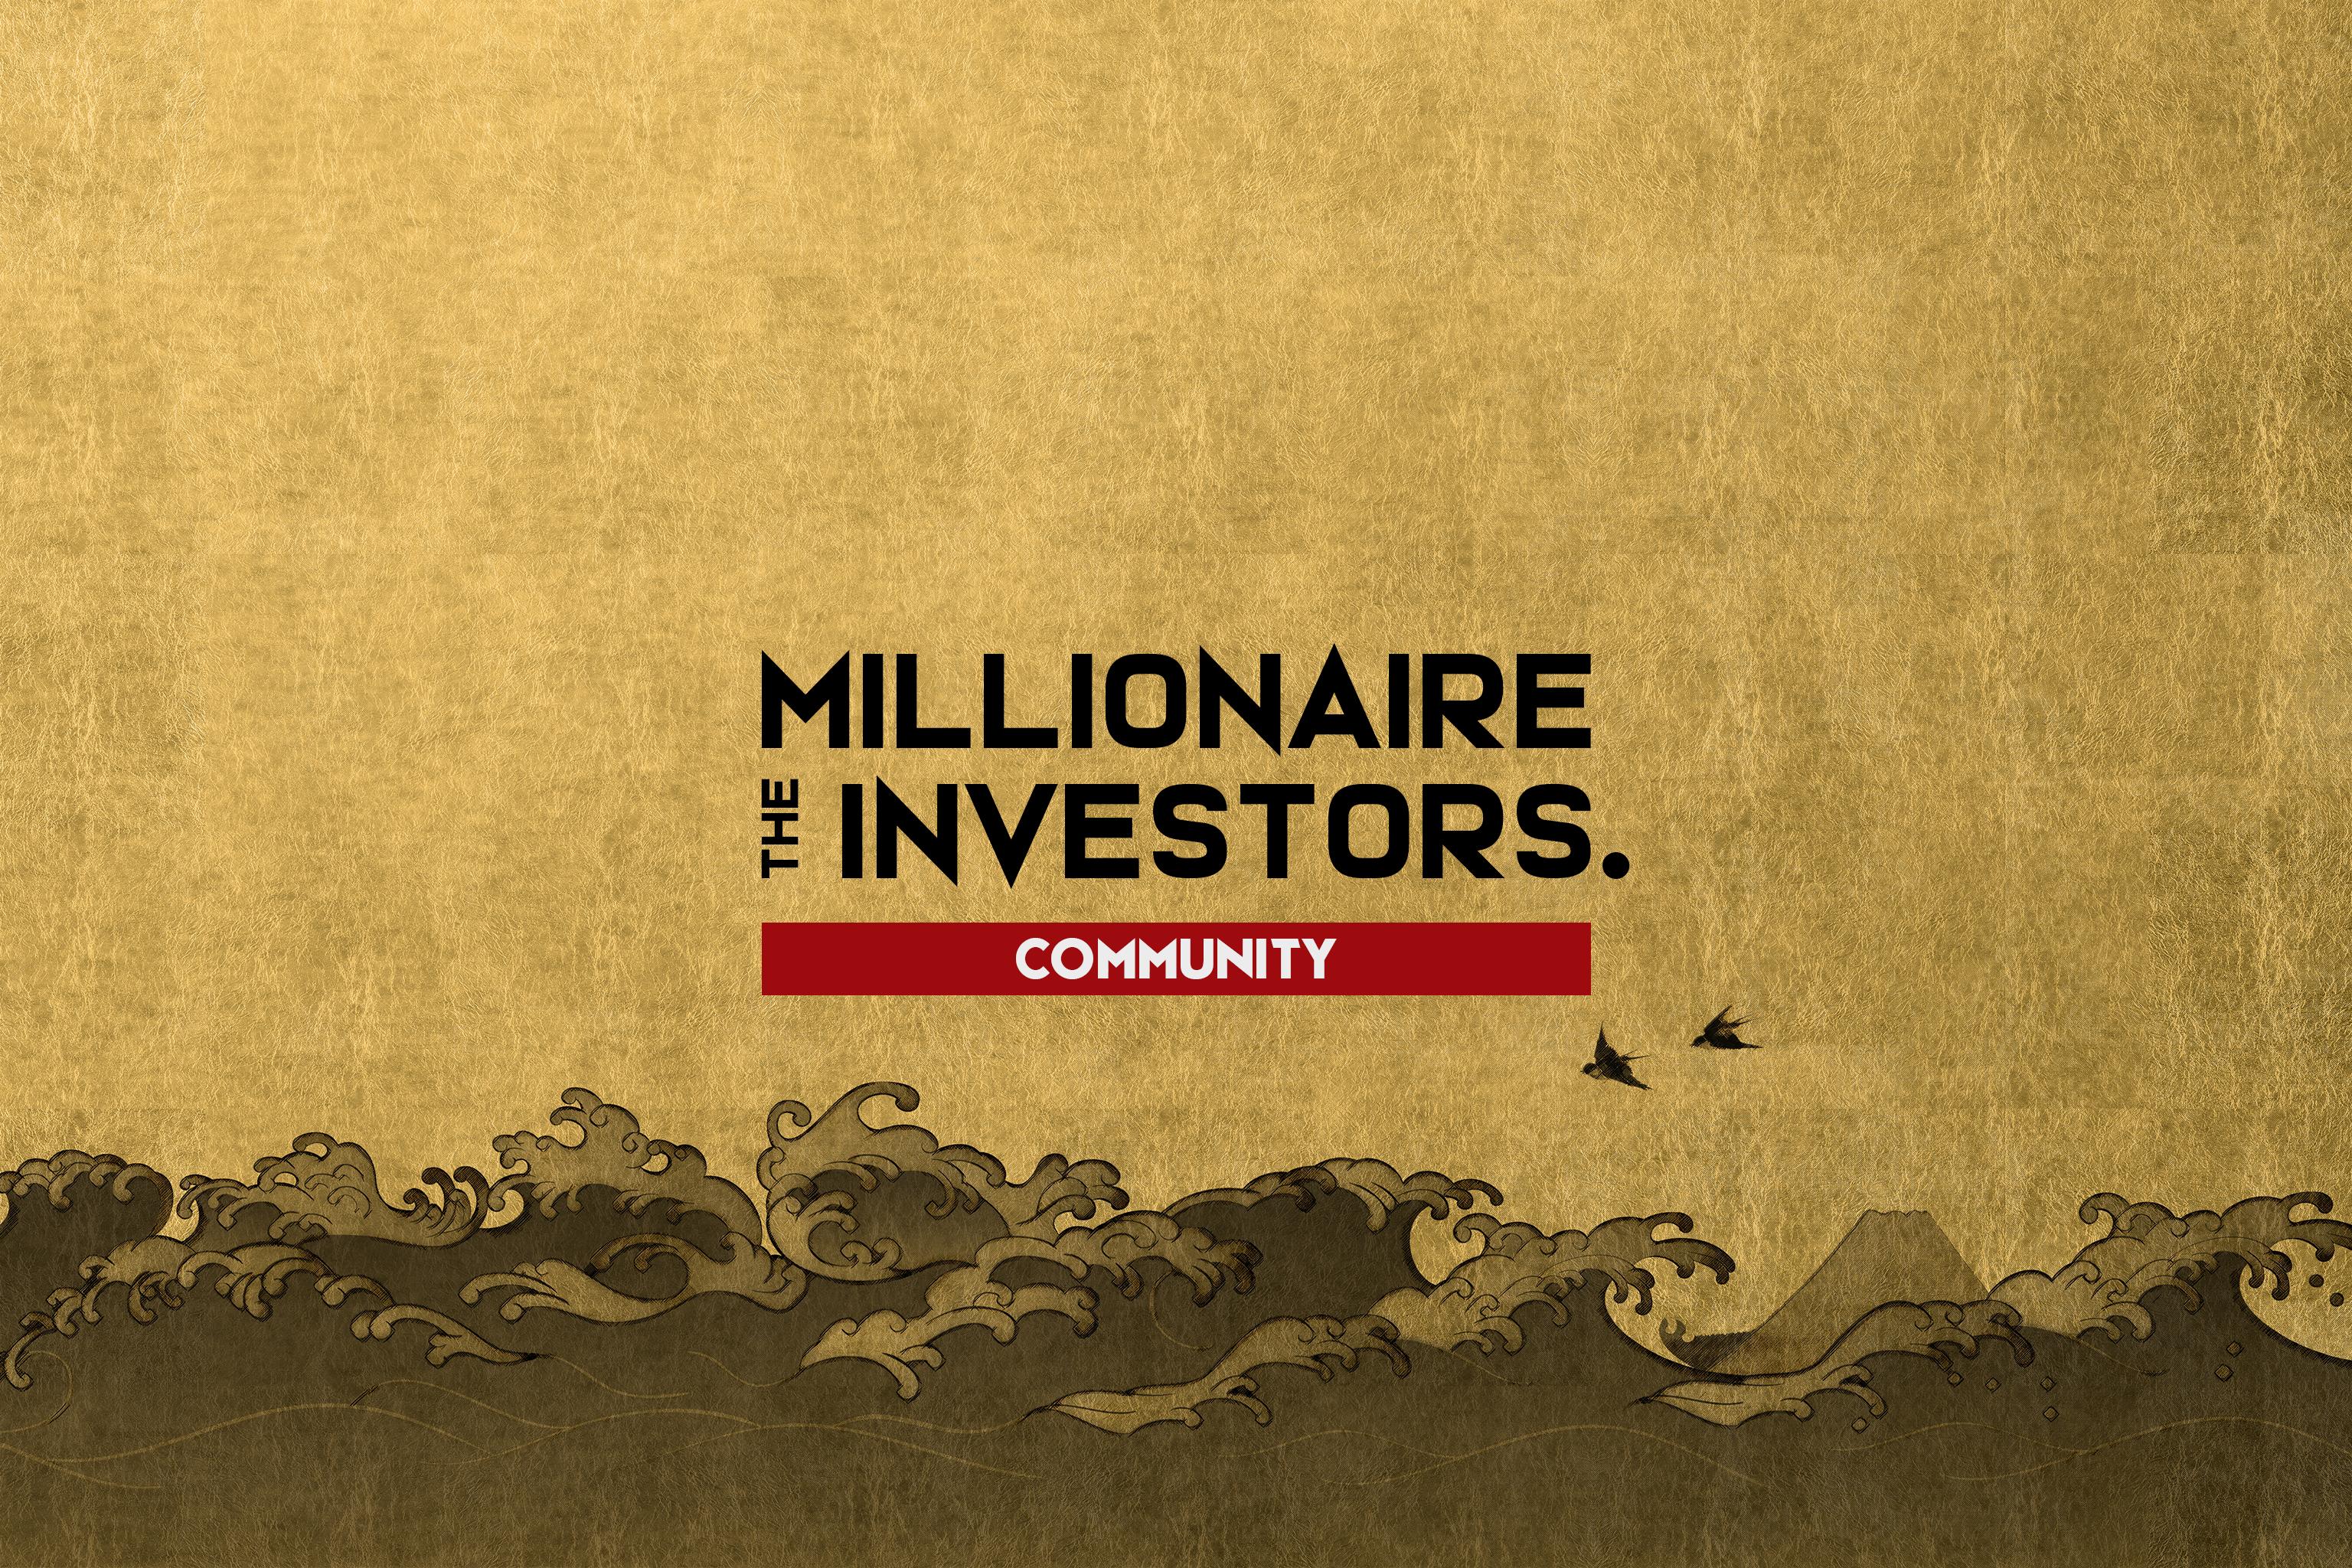 The Millionaire Investors